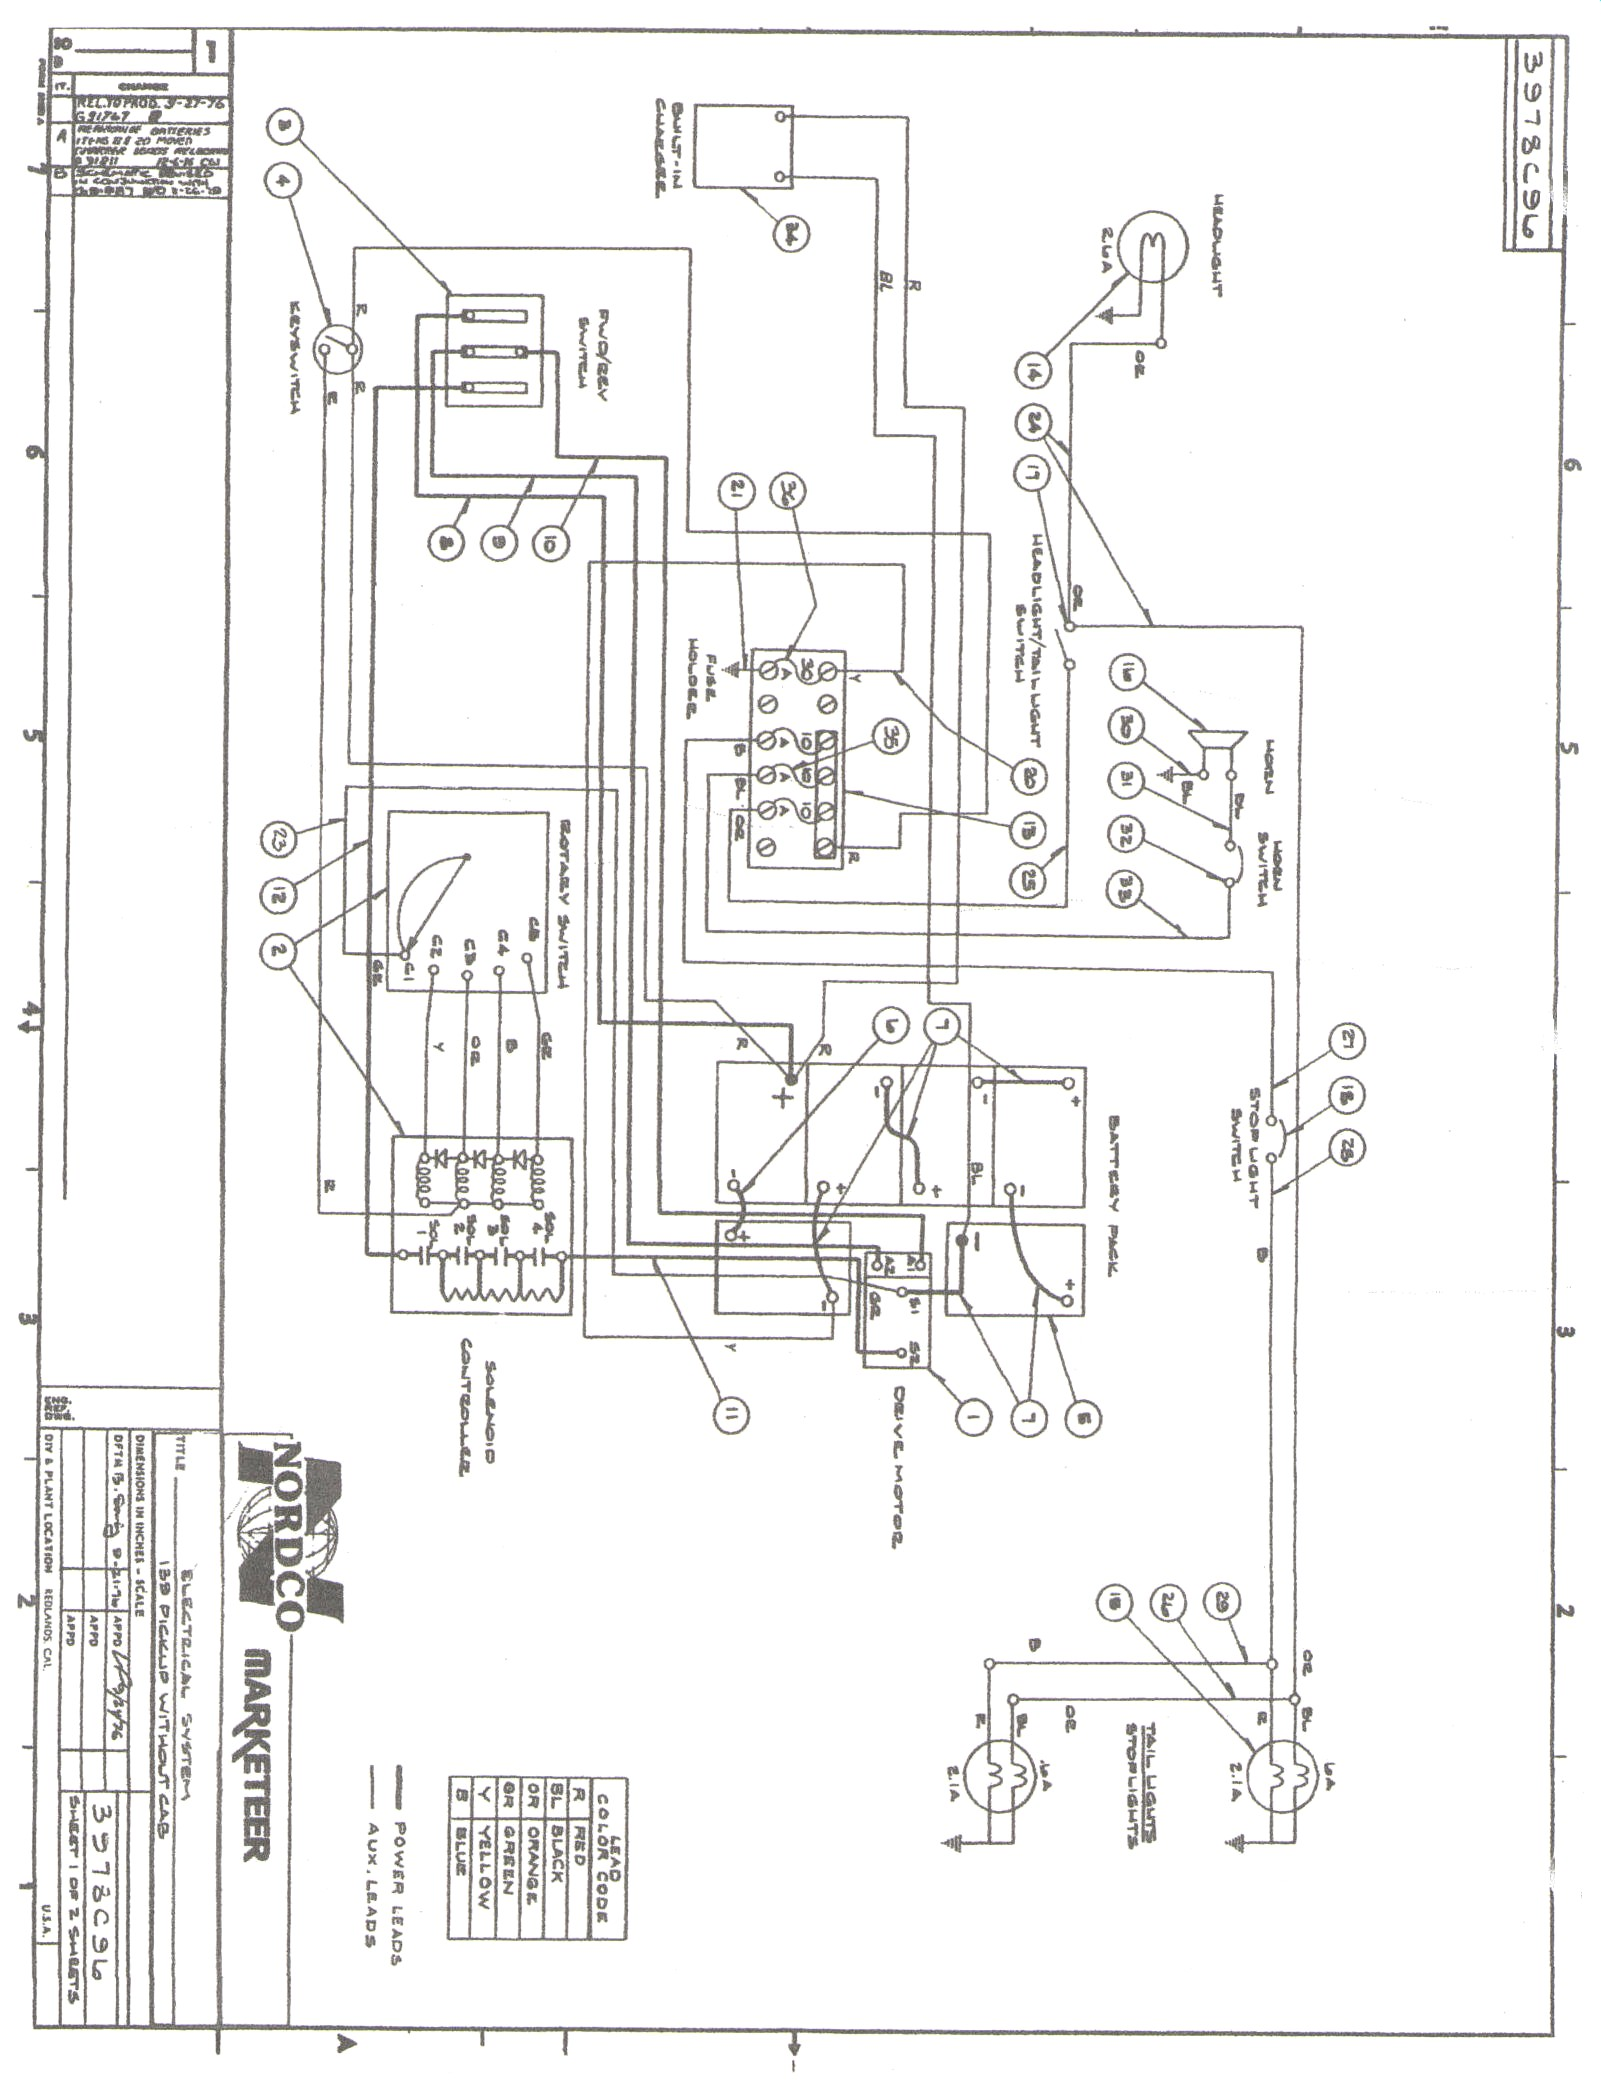 [FPWZ_2684]  LF_0272] 1986 Dodge Ram Wiring Diagram Http Wwwjustanswercom Dodge 5T2N4 Schematic  Wiring | 1986 Dodge D150 Wiring Diagram |  | Rmine Hyedi Mohammedshrine Librar Wiring 101